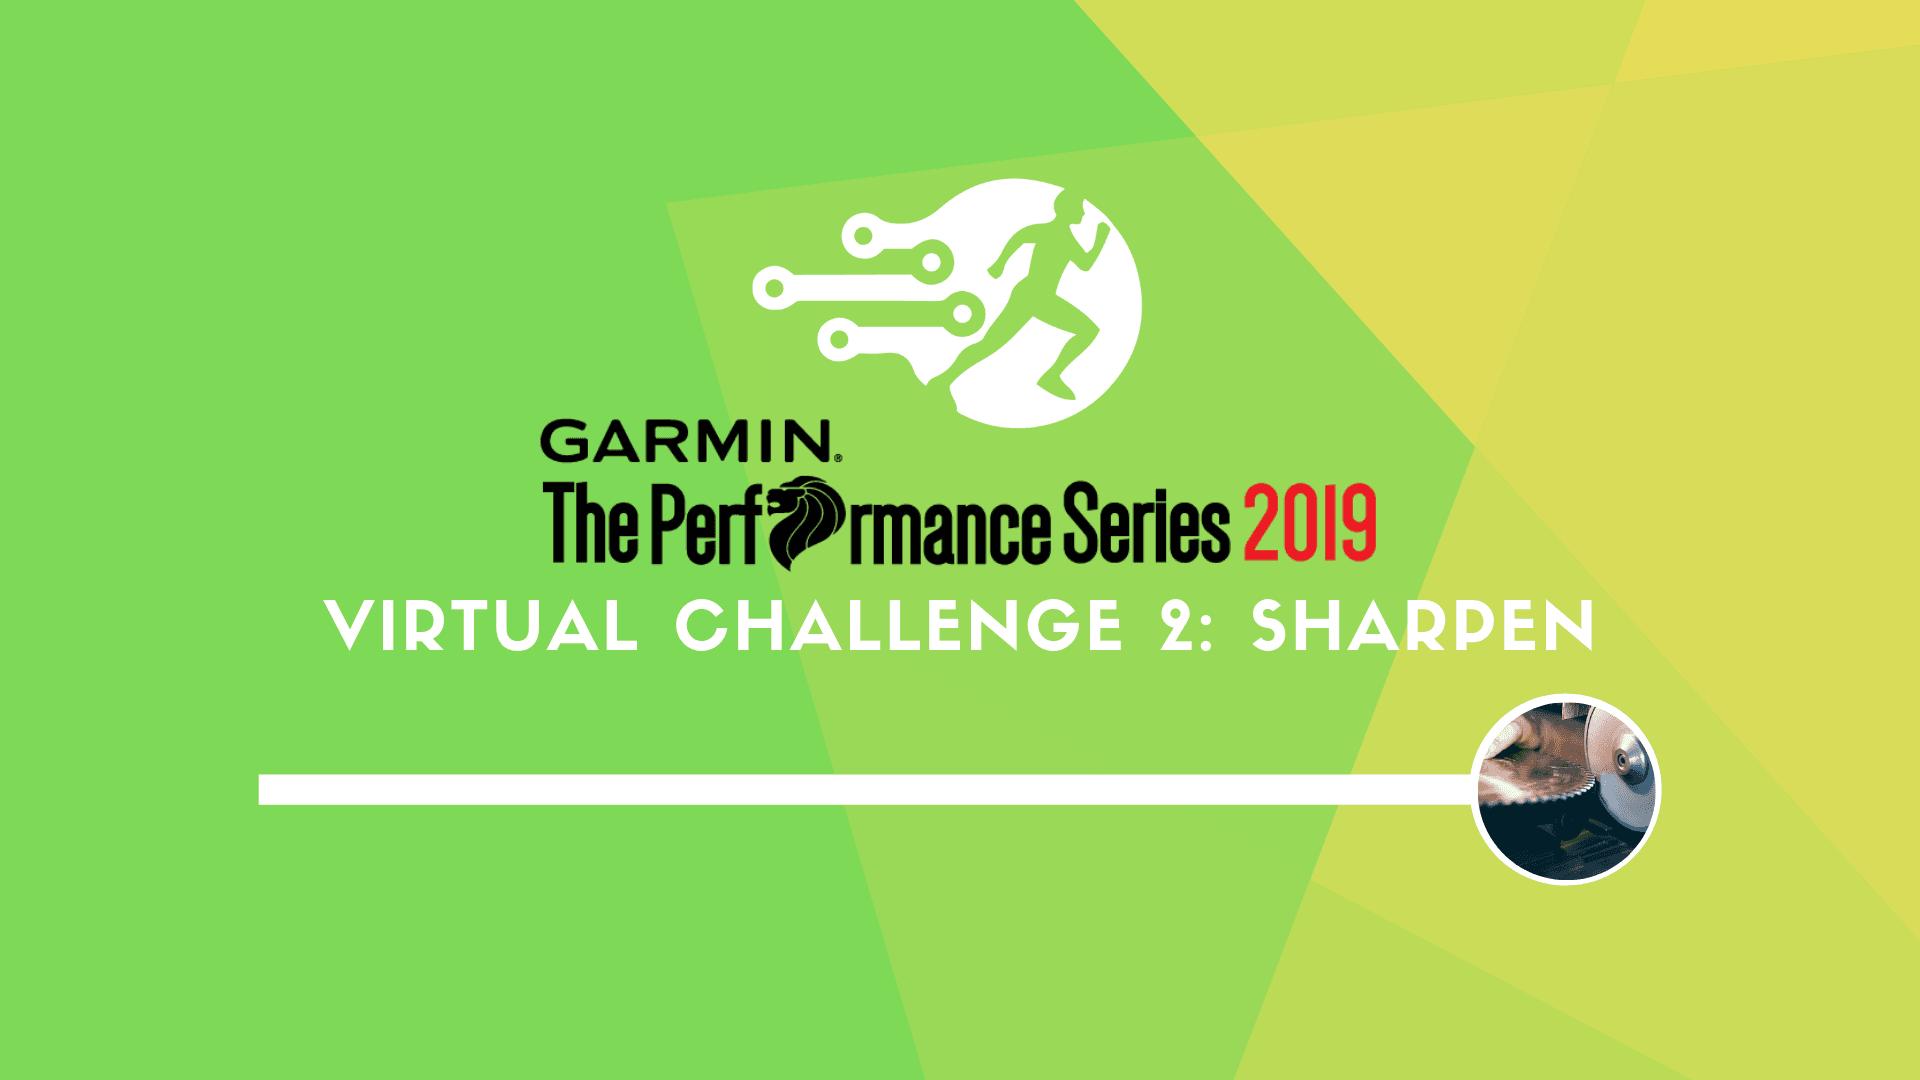 Logo of Garmin The Performance Series 2019 Virtual Challenge 2: Sharpen